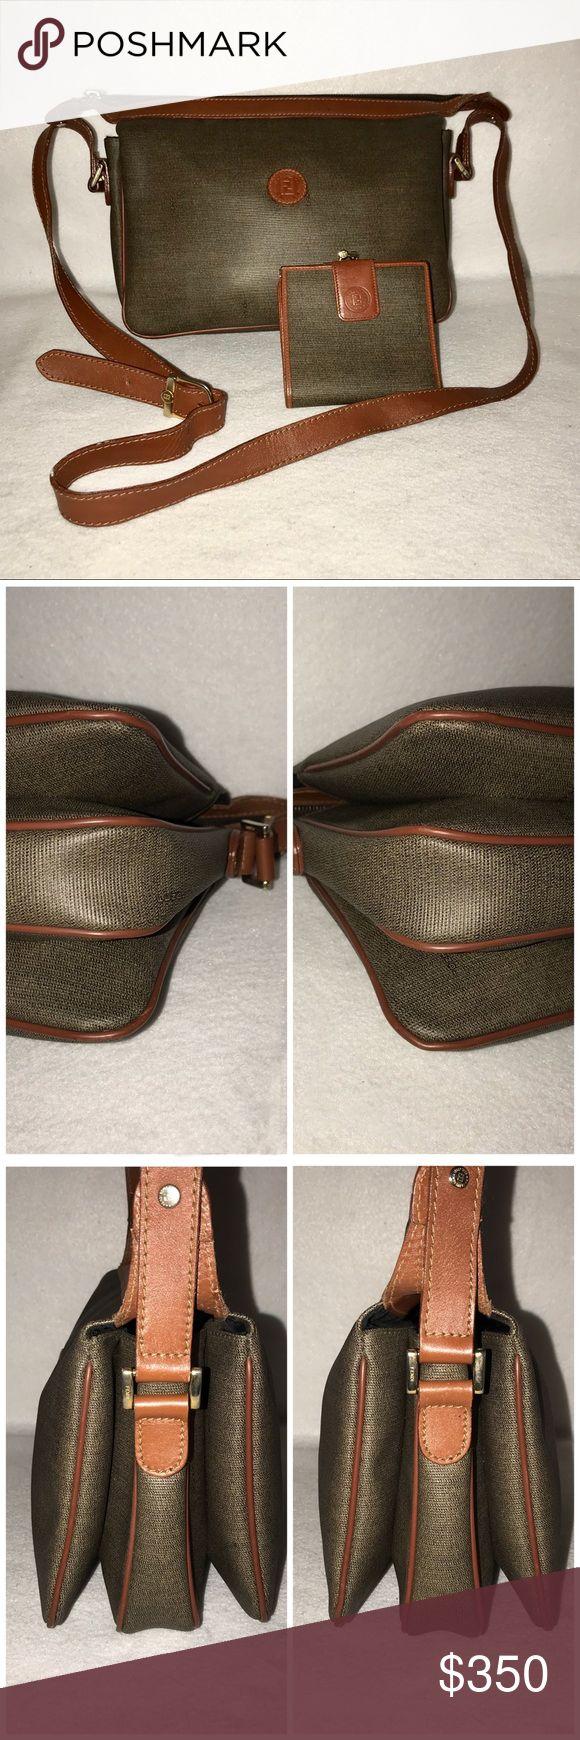 "2pc Vintage FENDI Pequin Crossbody Bag & Wallet 👉TRADE VALUE: $450👈  🌟 BOTH IN GREAT VINTAGE CONDITION Minimal wear. No damage.  Length: 12"" Height: 8"" Depth: 4"" Strap drop: 18""-22"" (adjustable) Fendi Bags Crossbody Bags"